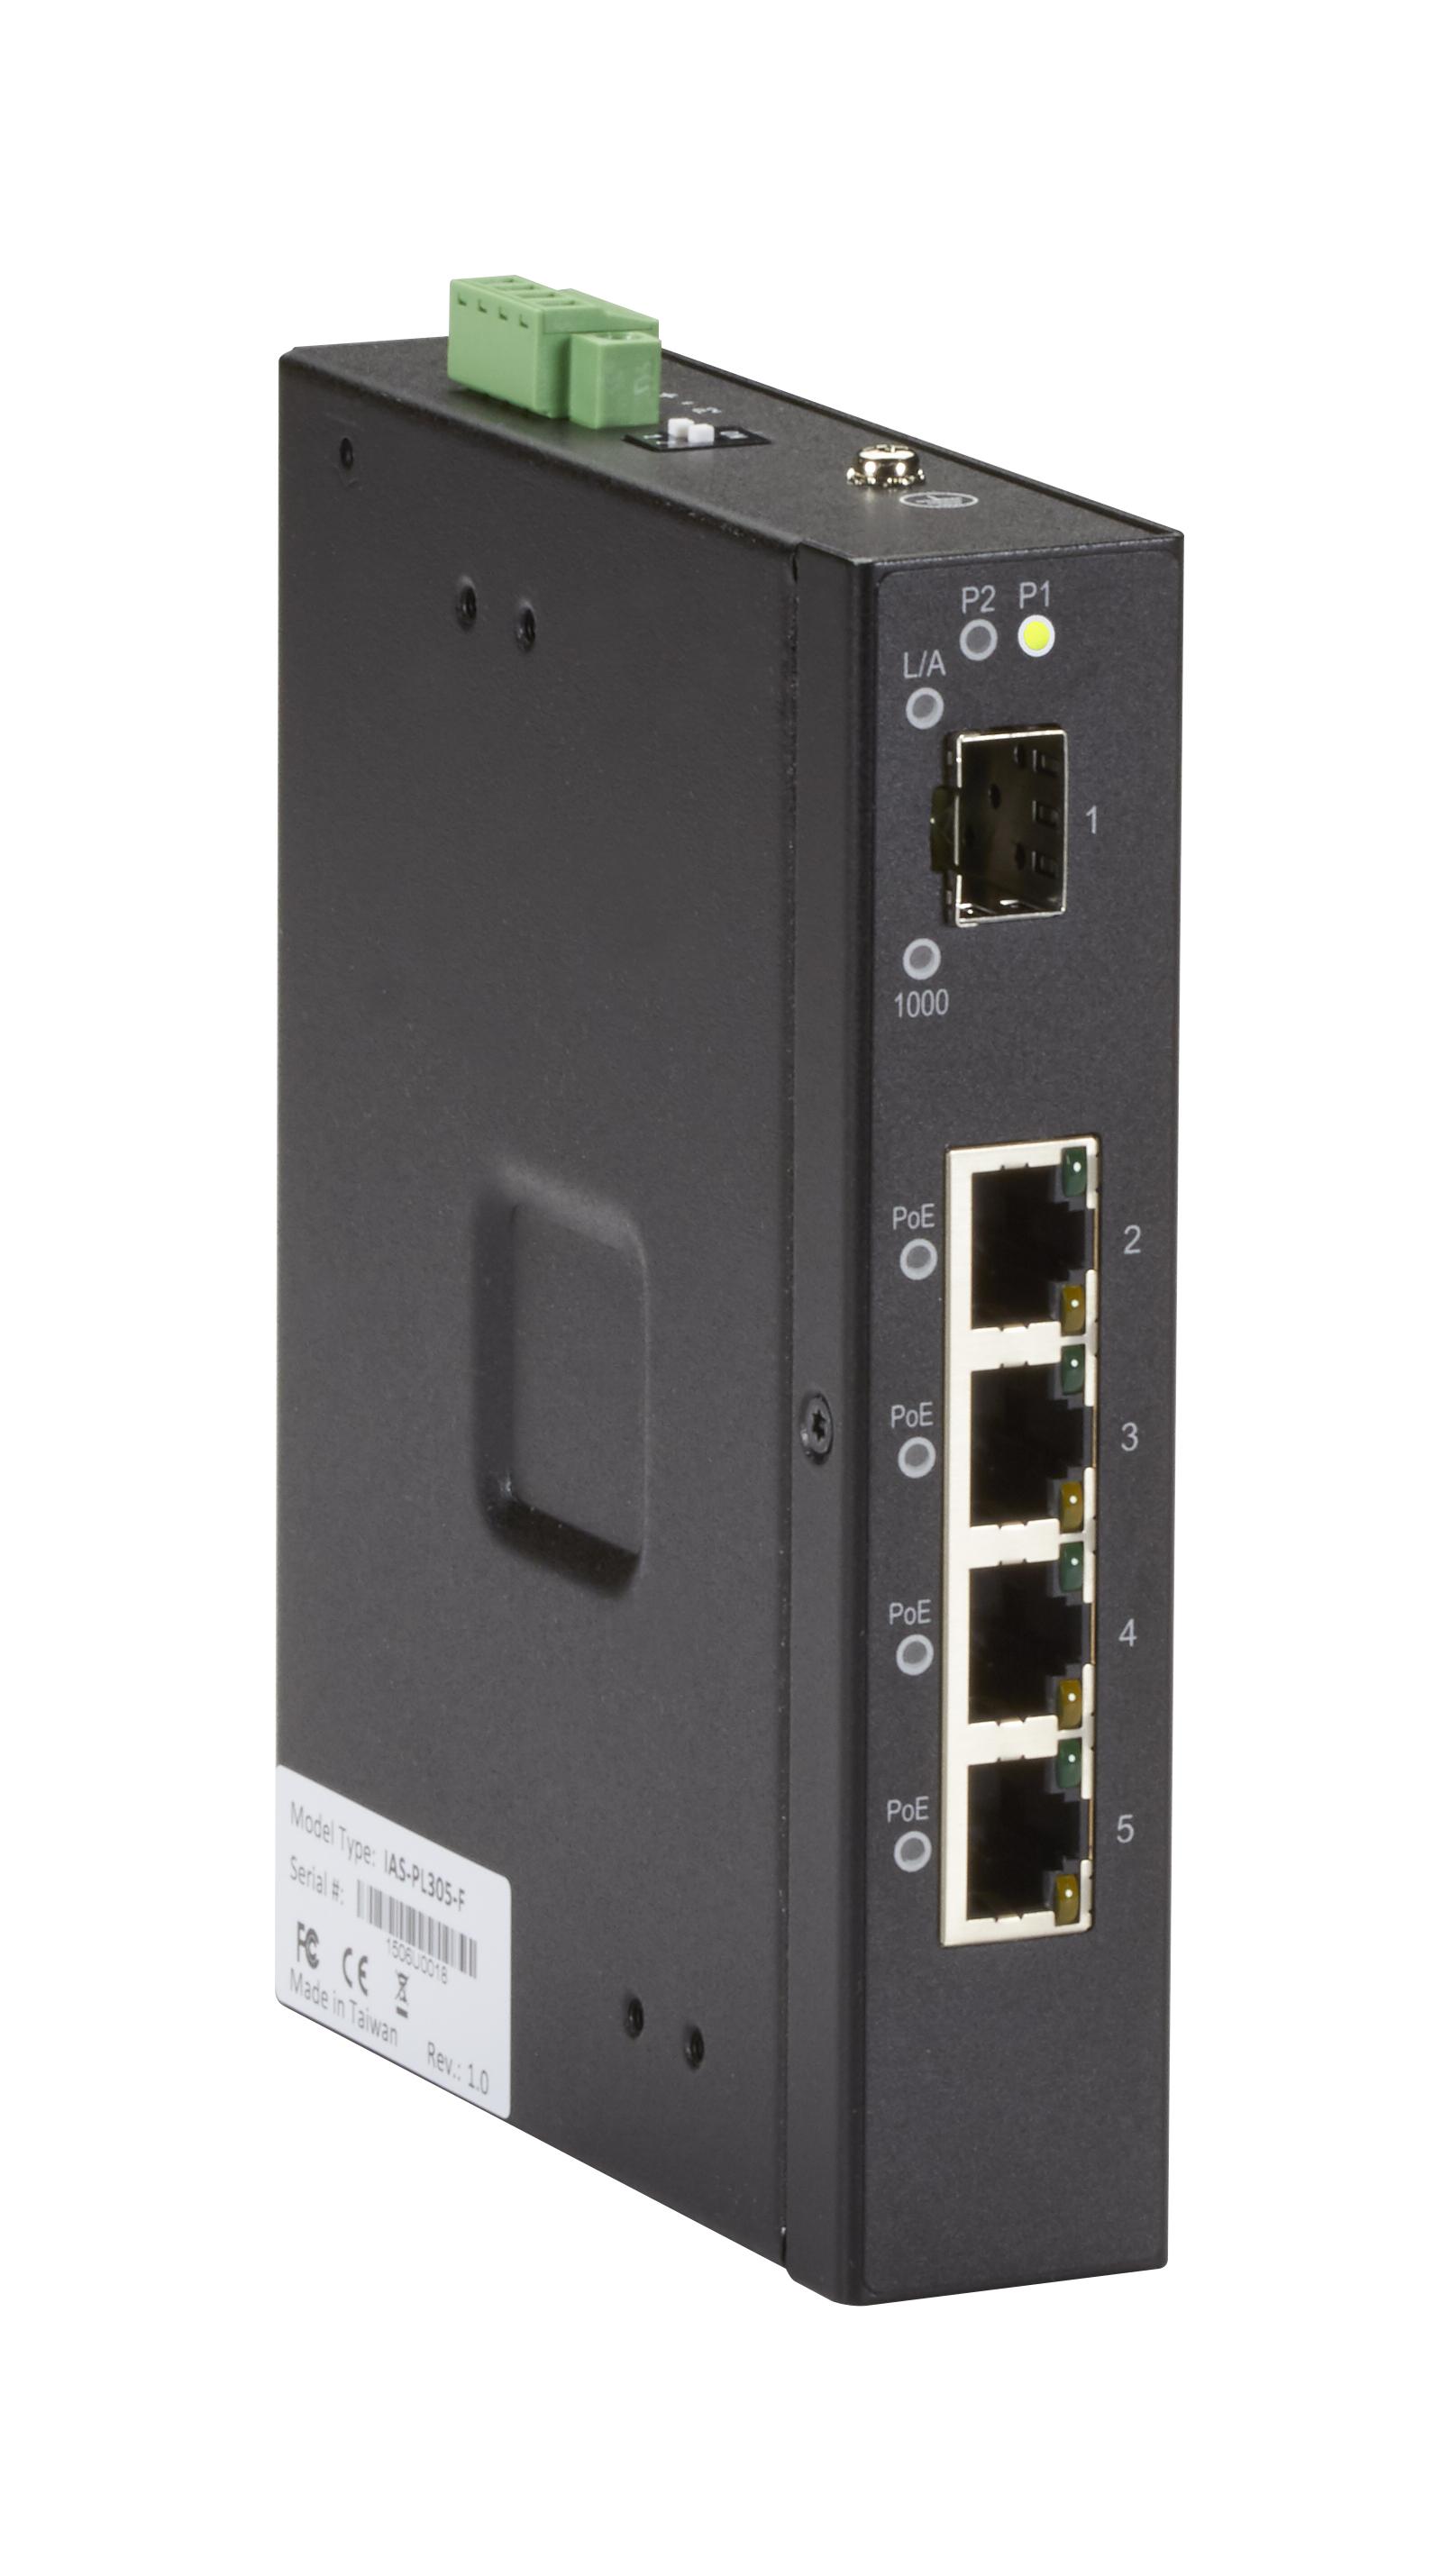 Industrial Gigabit Ethernet PoE+ Switch - (4) RJ-45, (1) SFP